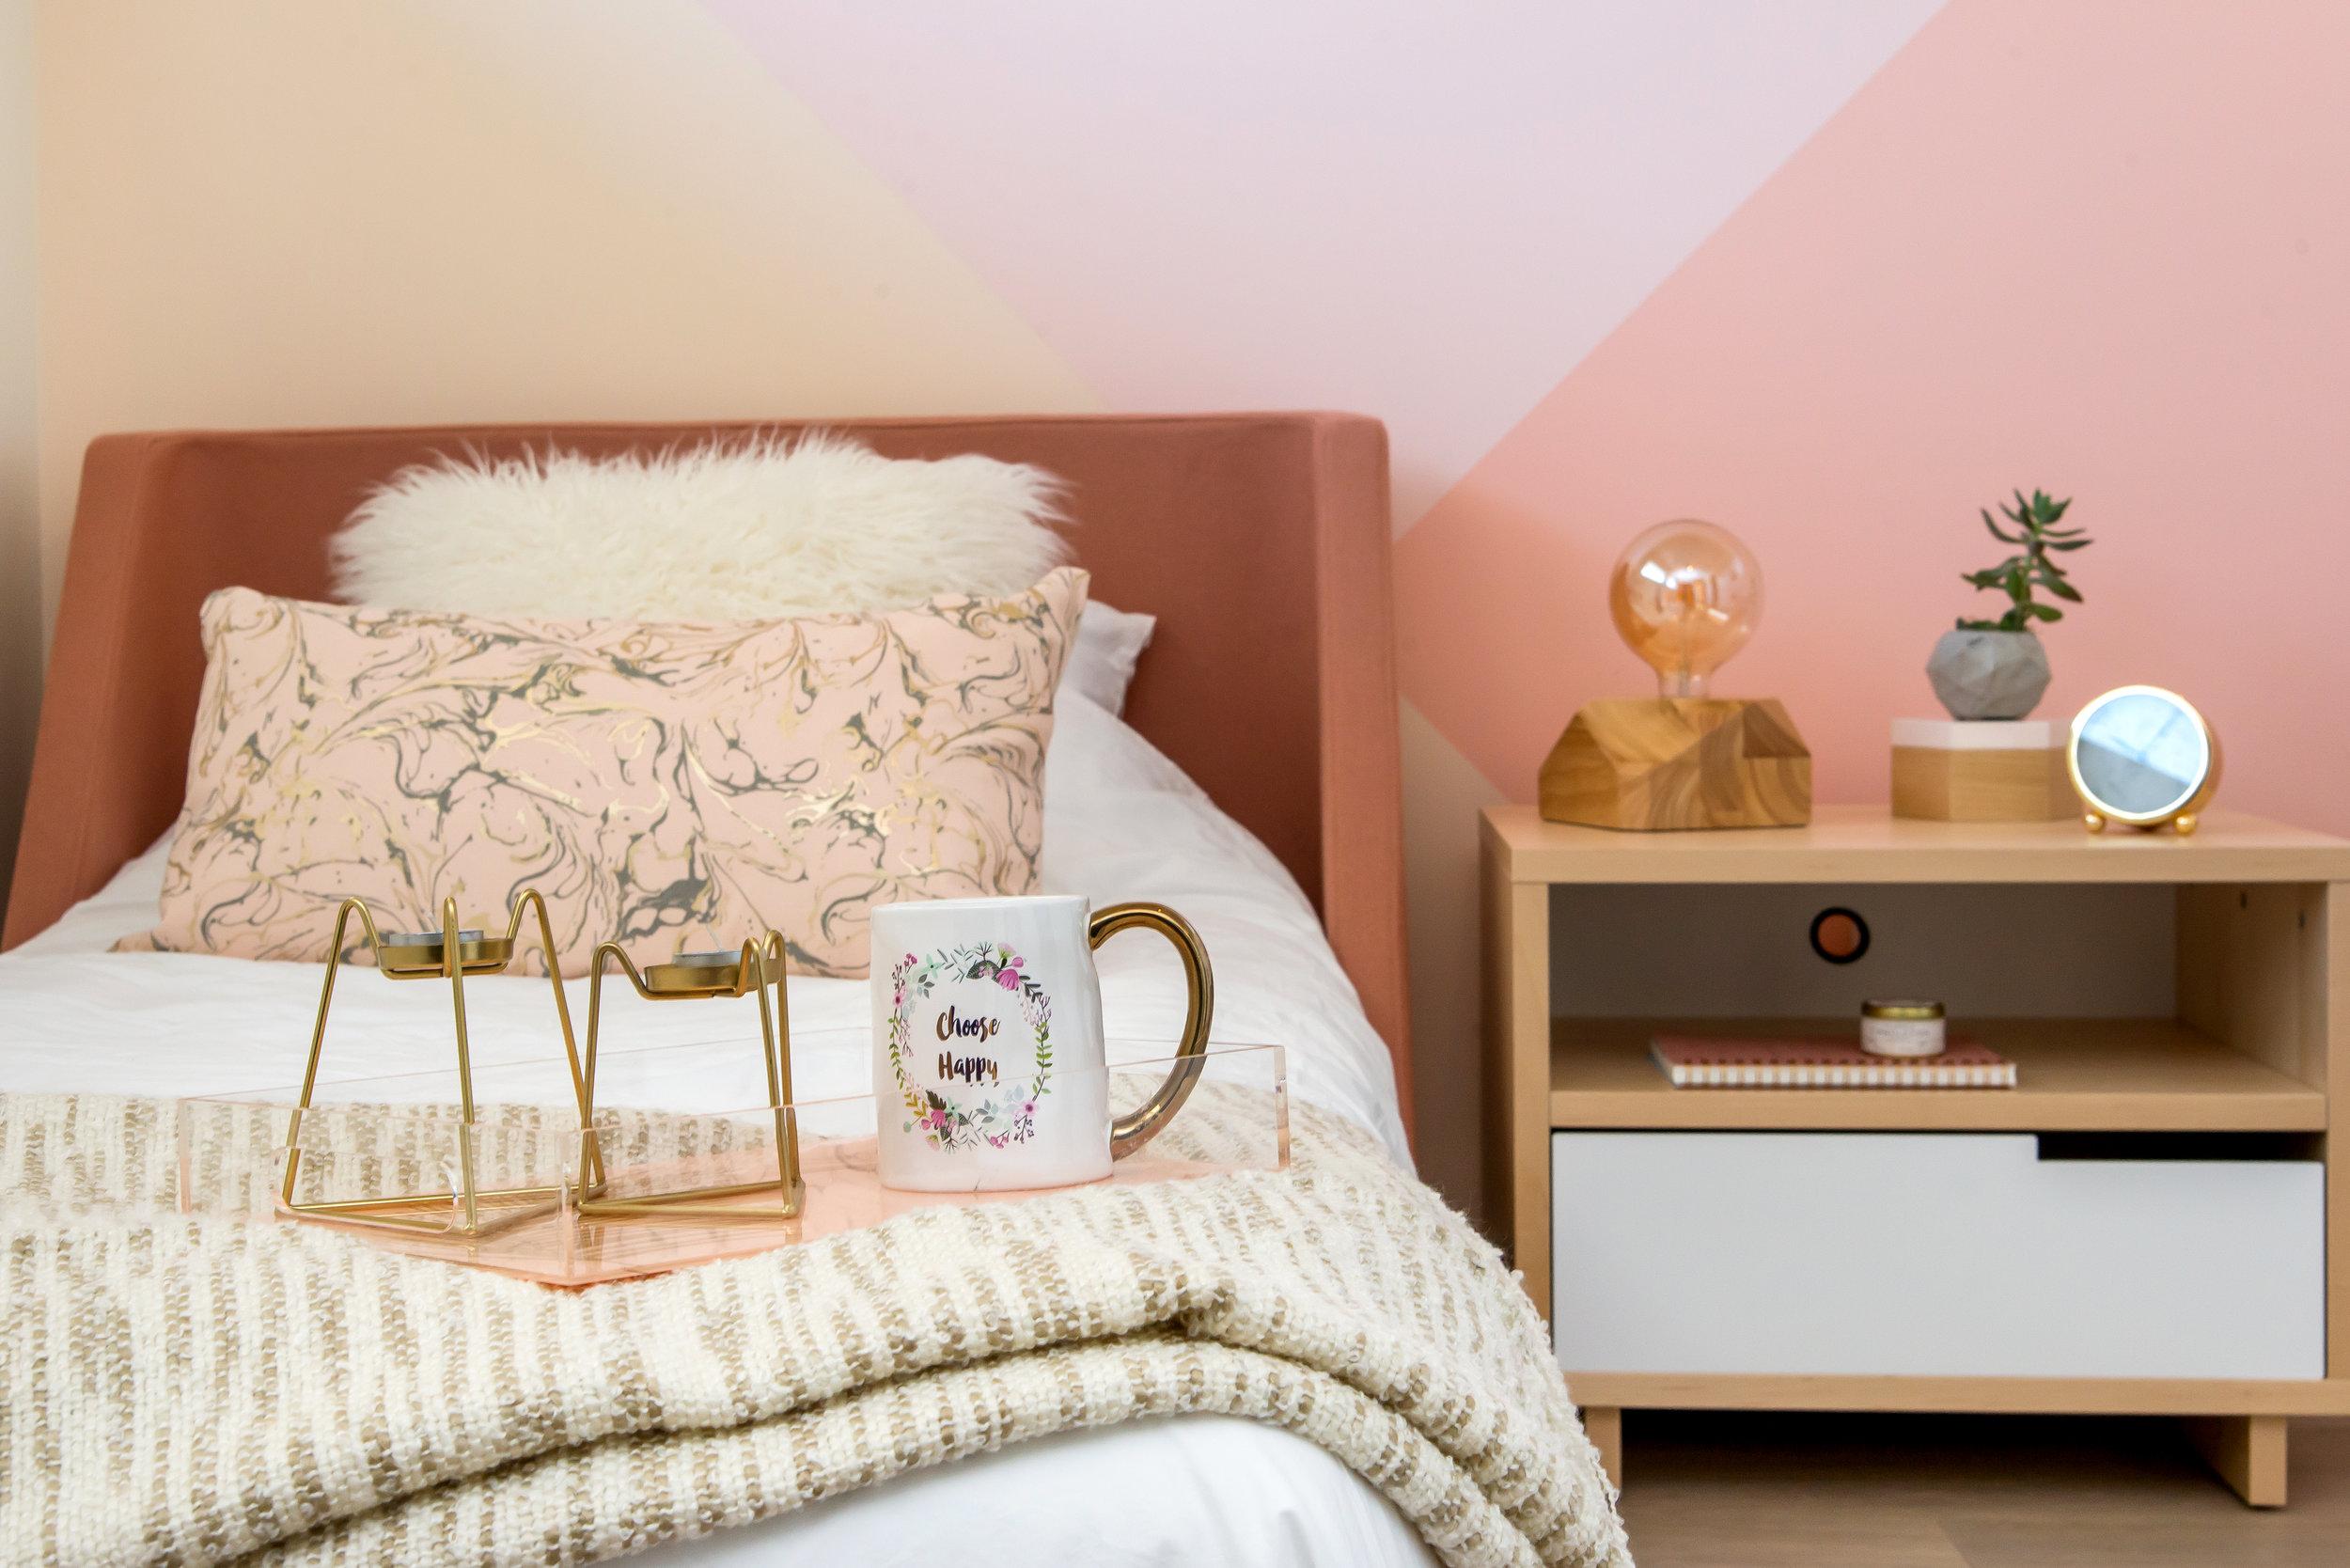 The colour palette: - Benjamin MooreBridal Pink 2013-70Pink Harmony 2013-60Springtime Peach 2014-50